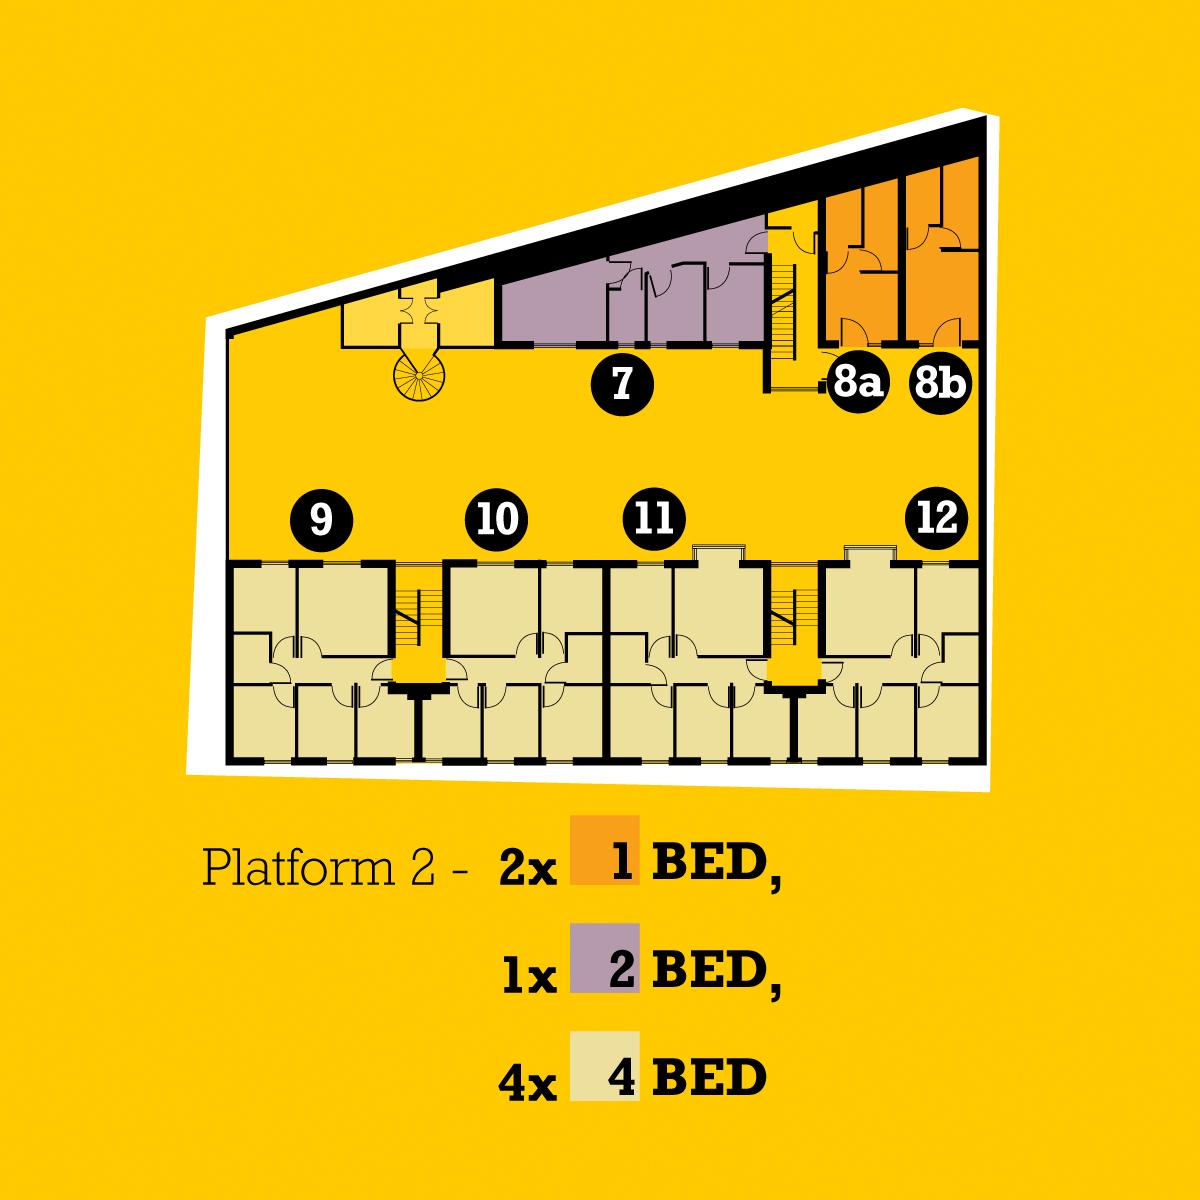 The Platform plans floor 2